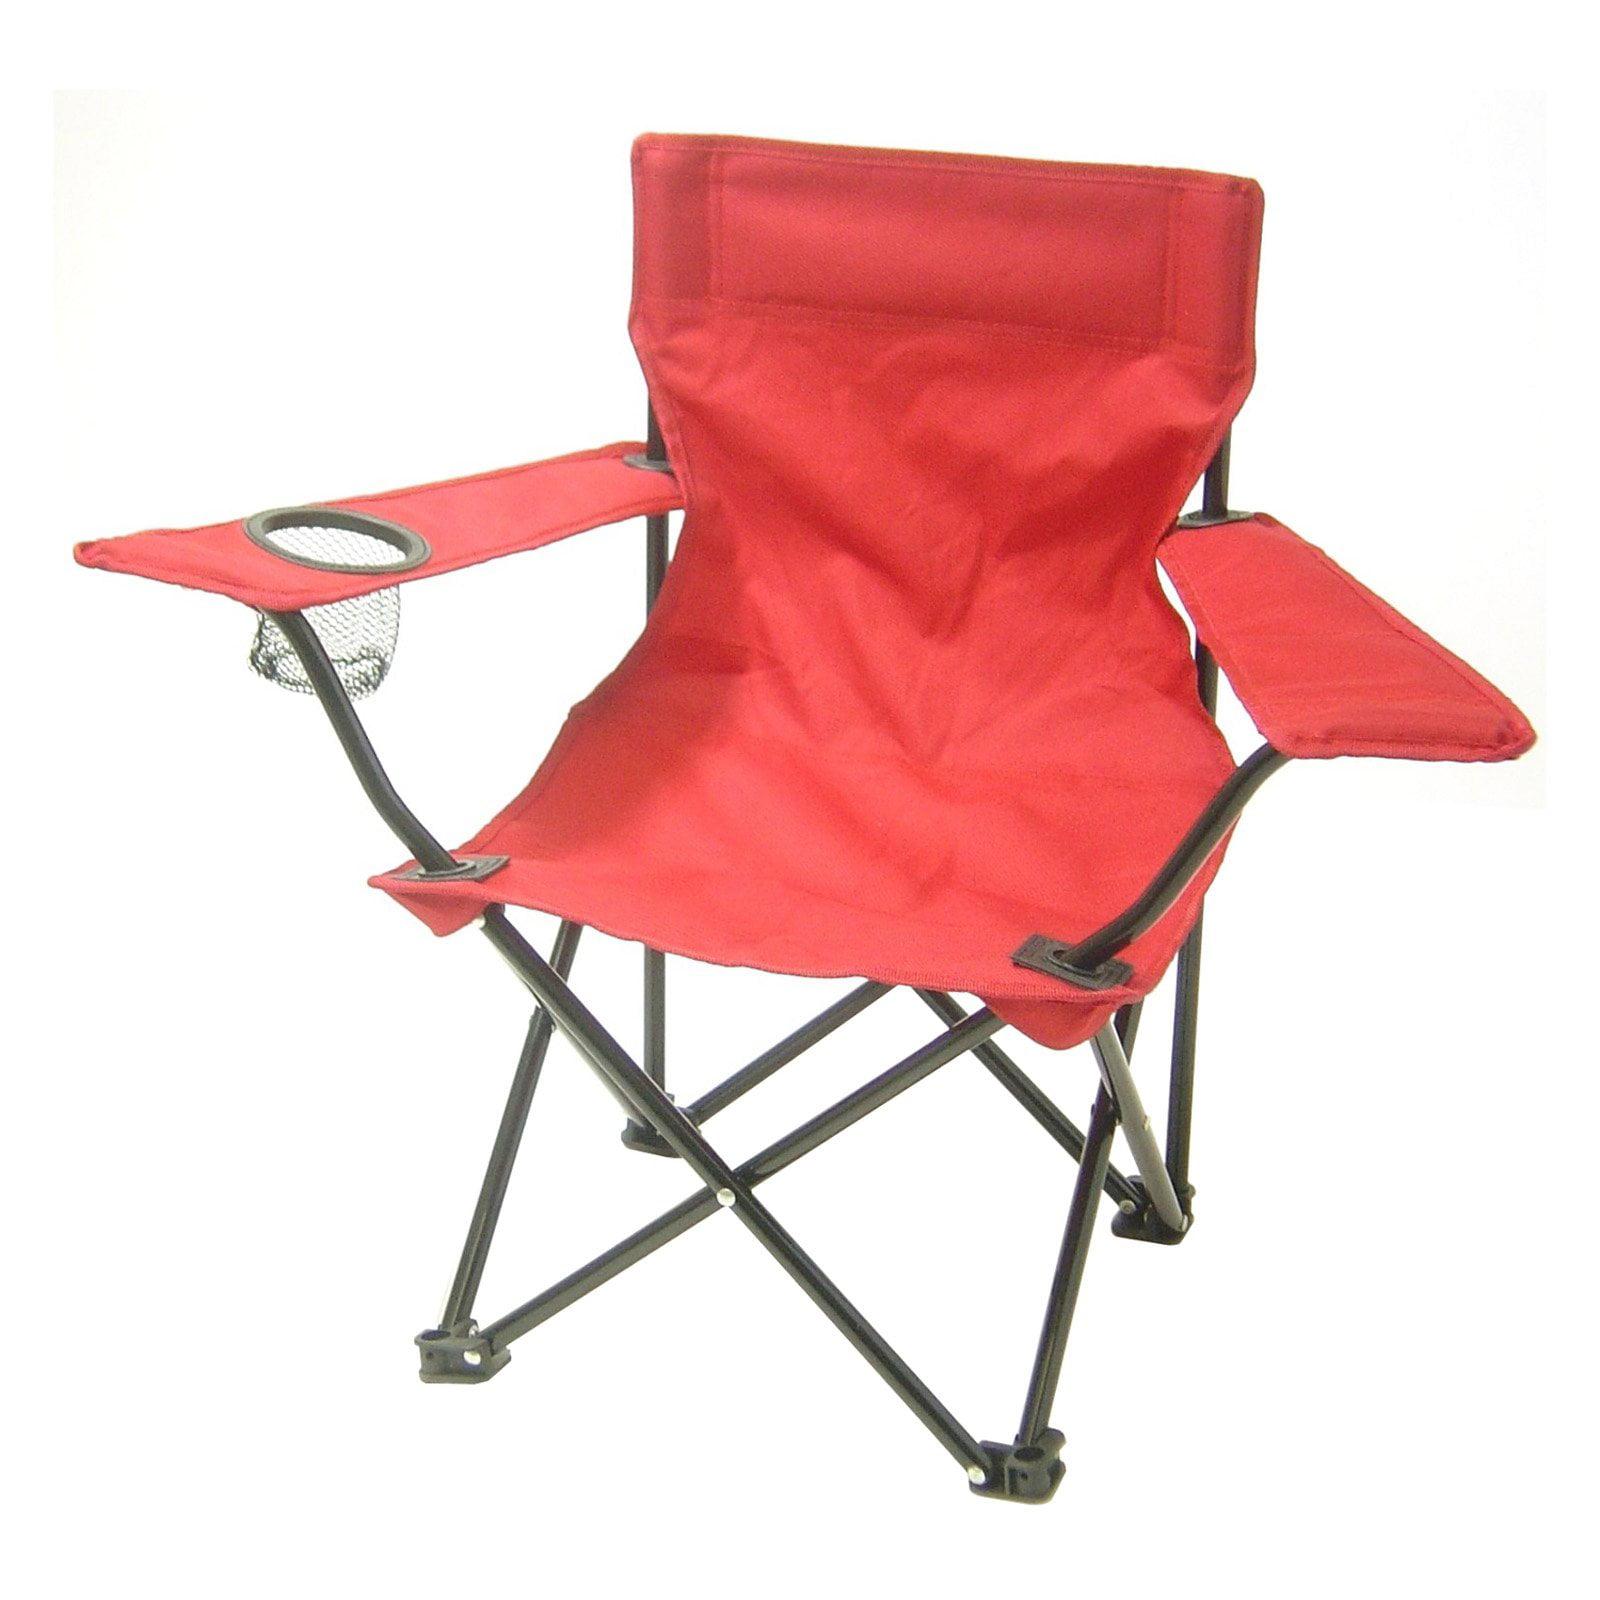 Astonishing Beach Baby Kids Folding Camp Chair With Matching Tote Bag Uwap Interior Chair Design Uwaporg